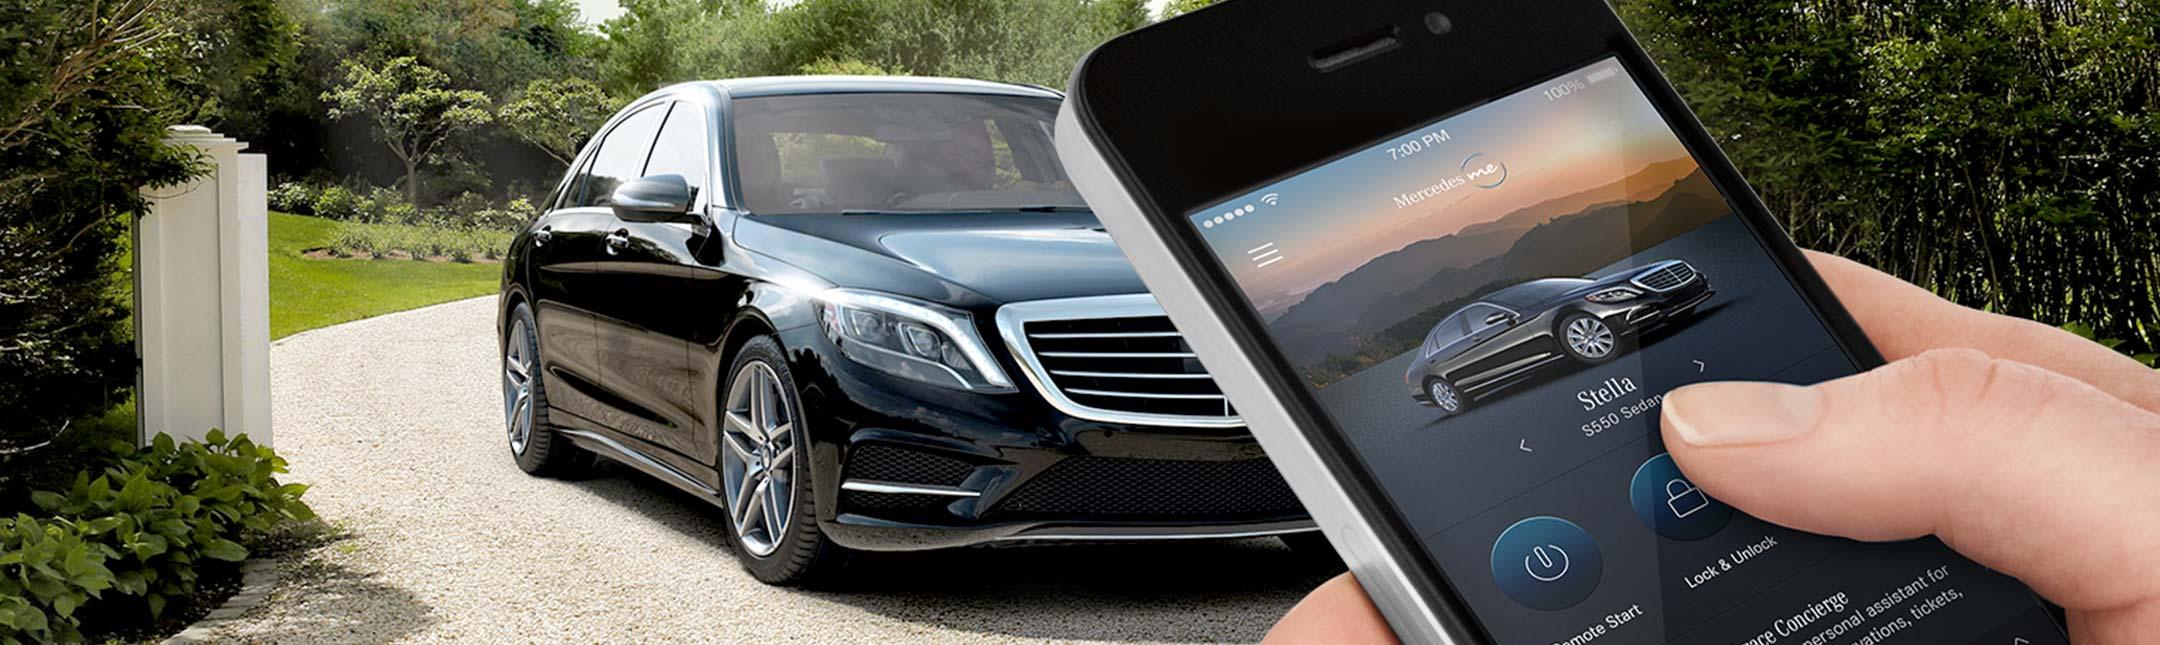 Mercedes benz of westwood new mercedes benz dealership for Mercedes benz westwood